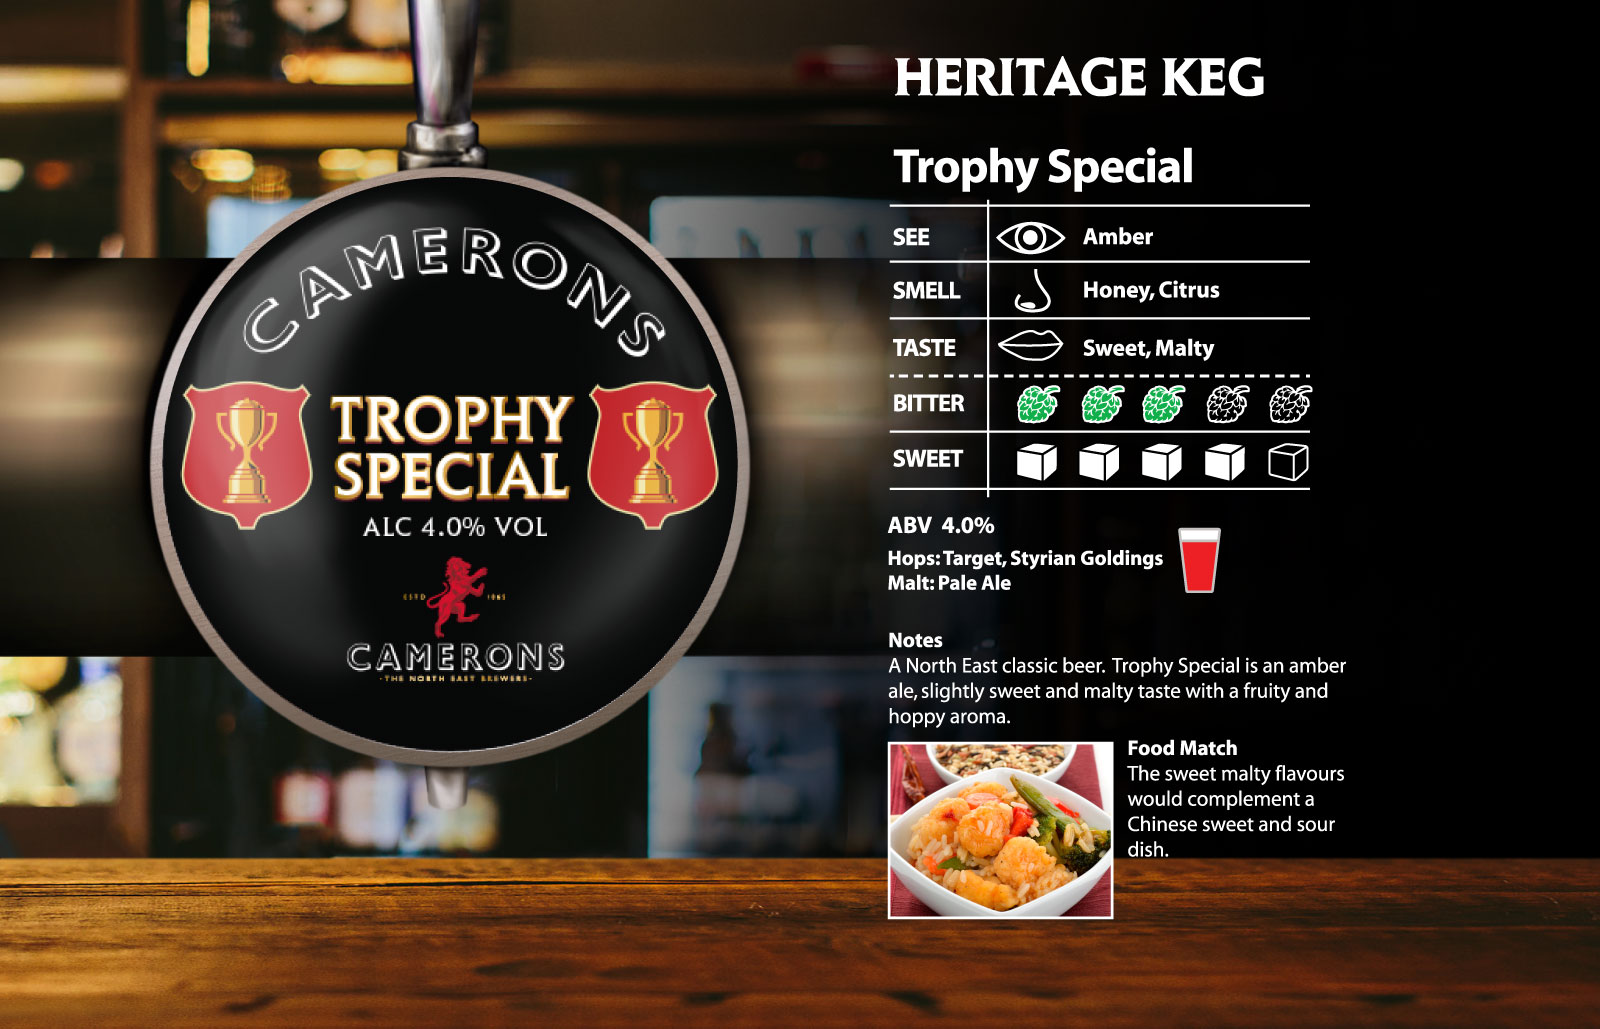 Trophy Special Heritage Keg